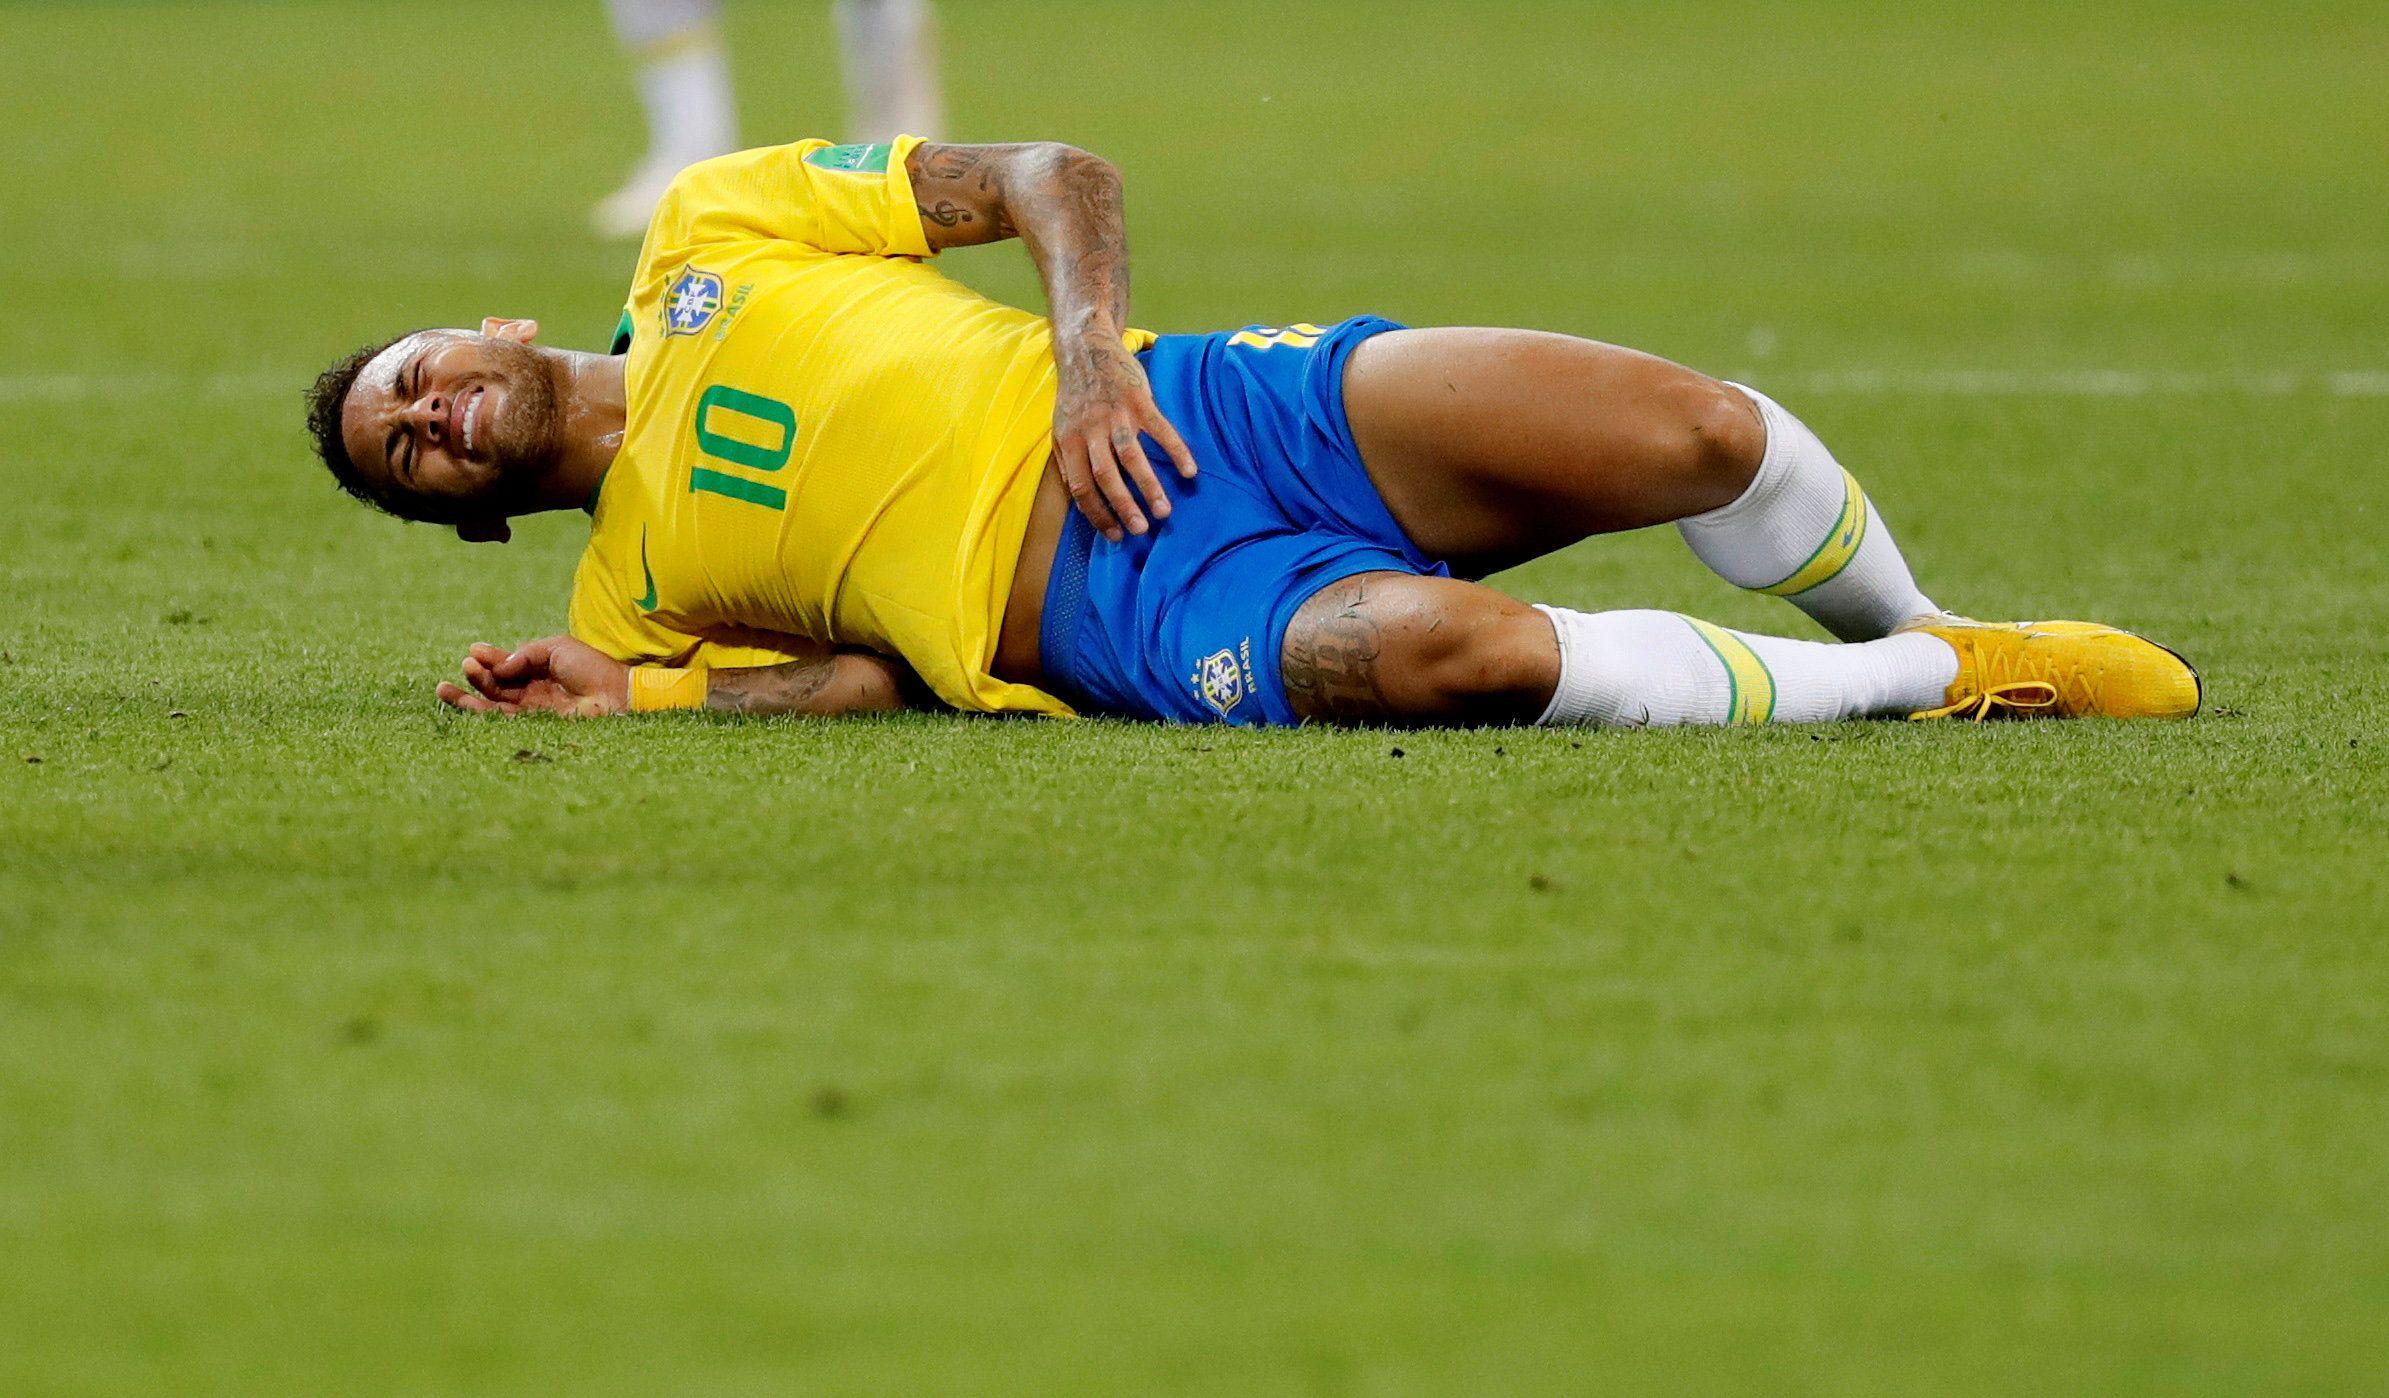 Football - Neymar parodie le «Neymar Challenge» avec des enfants